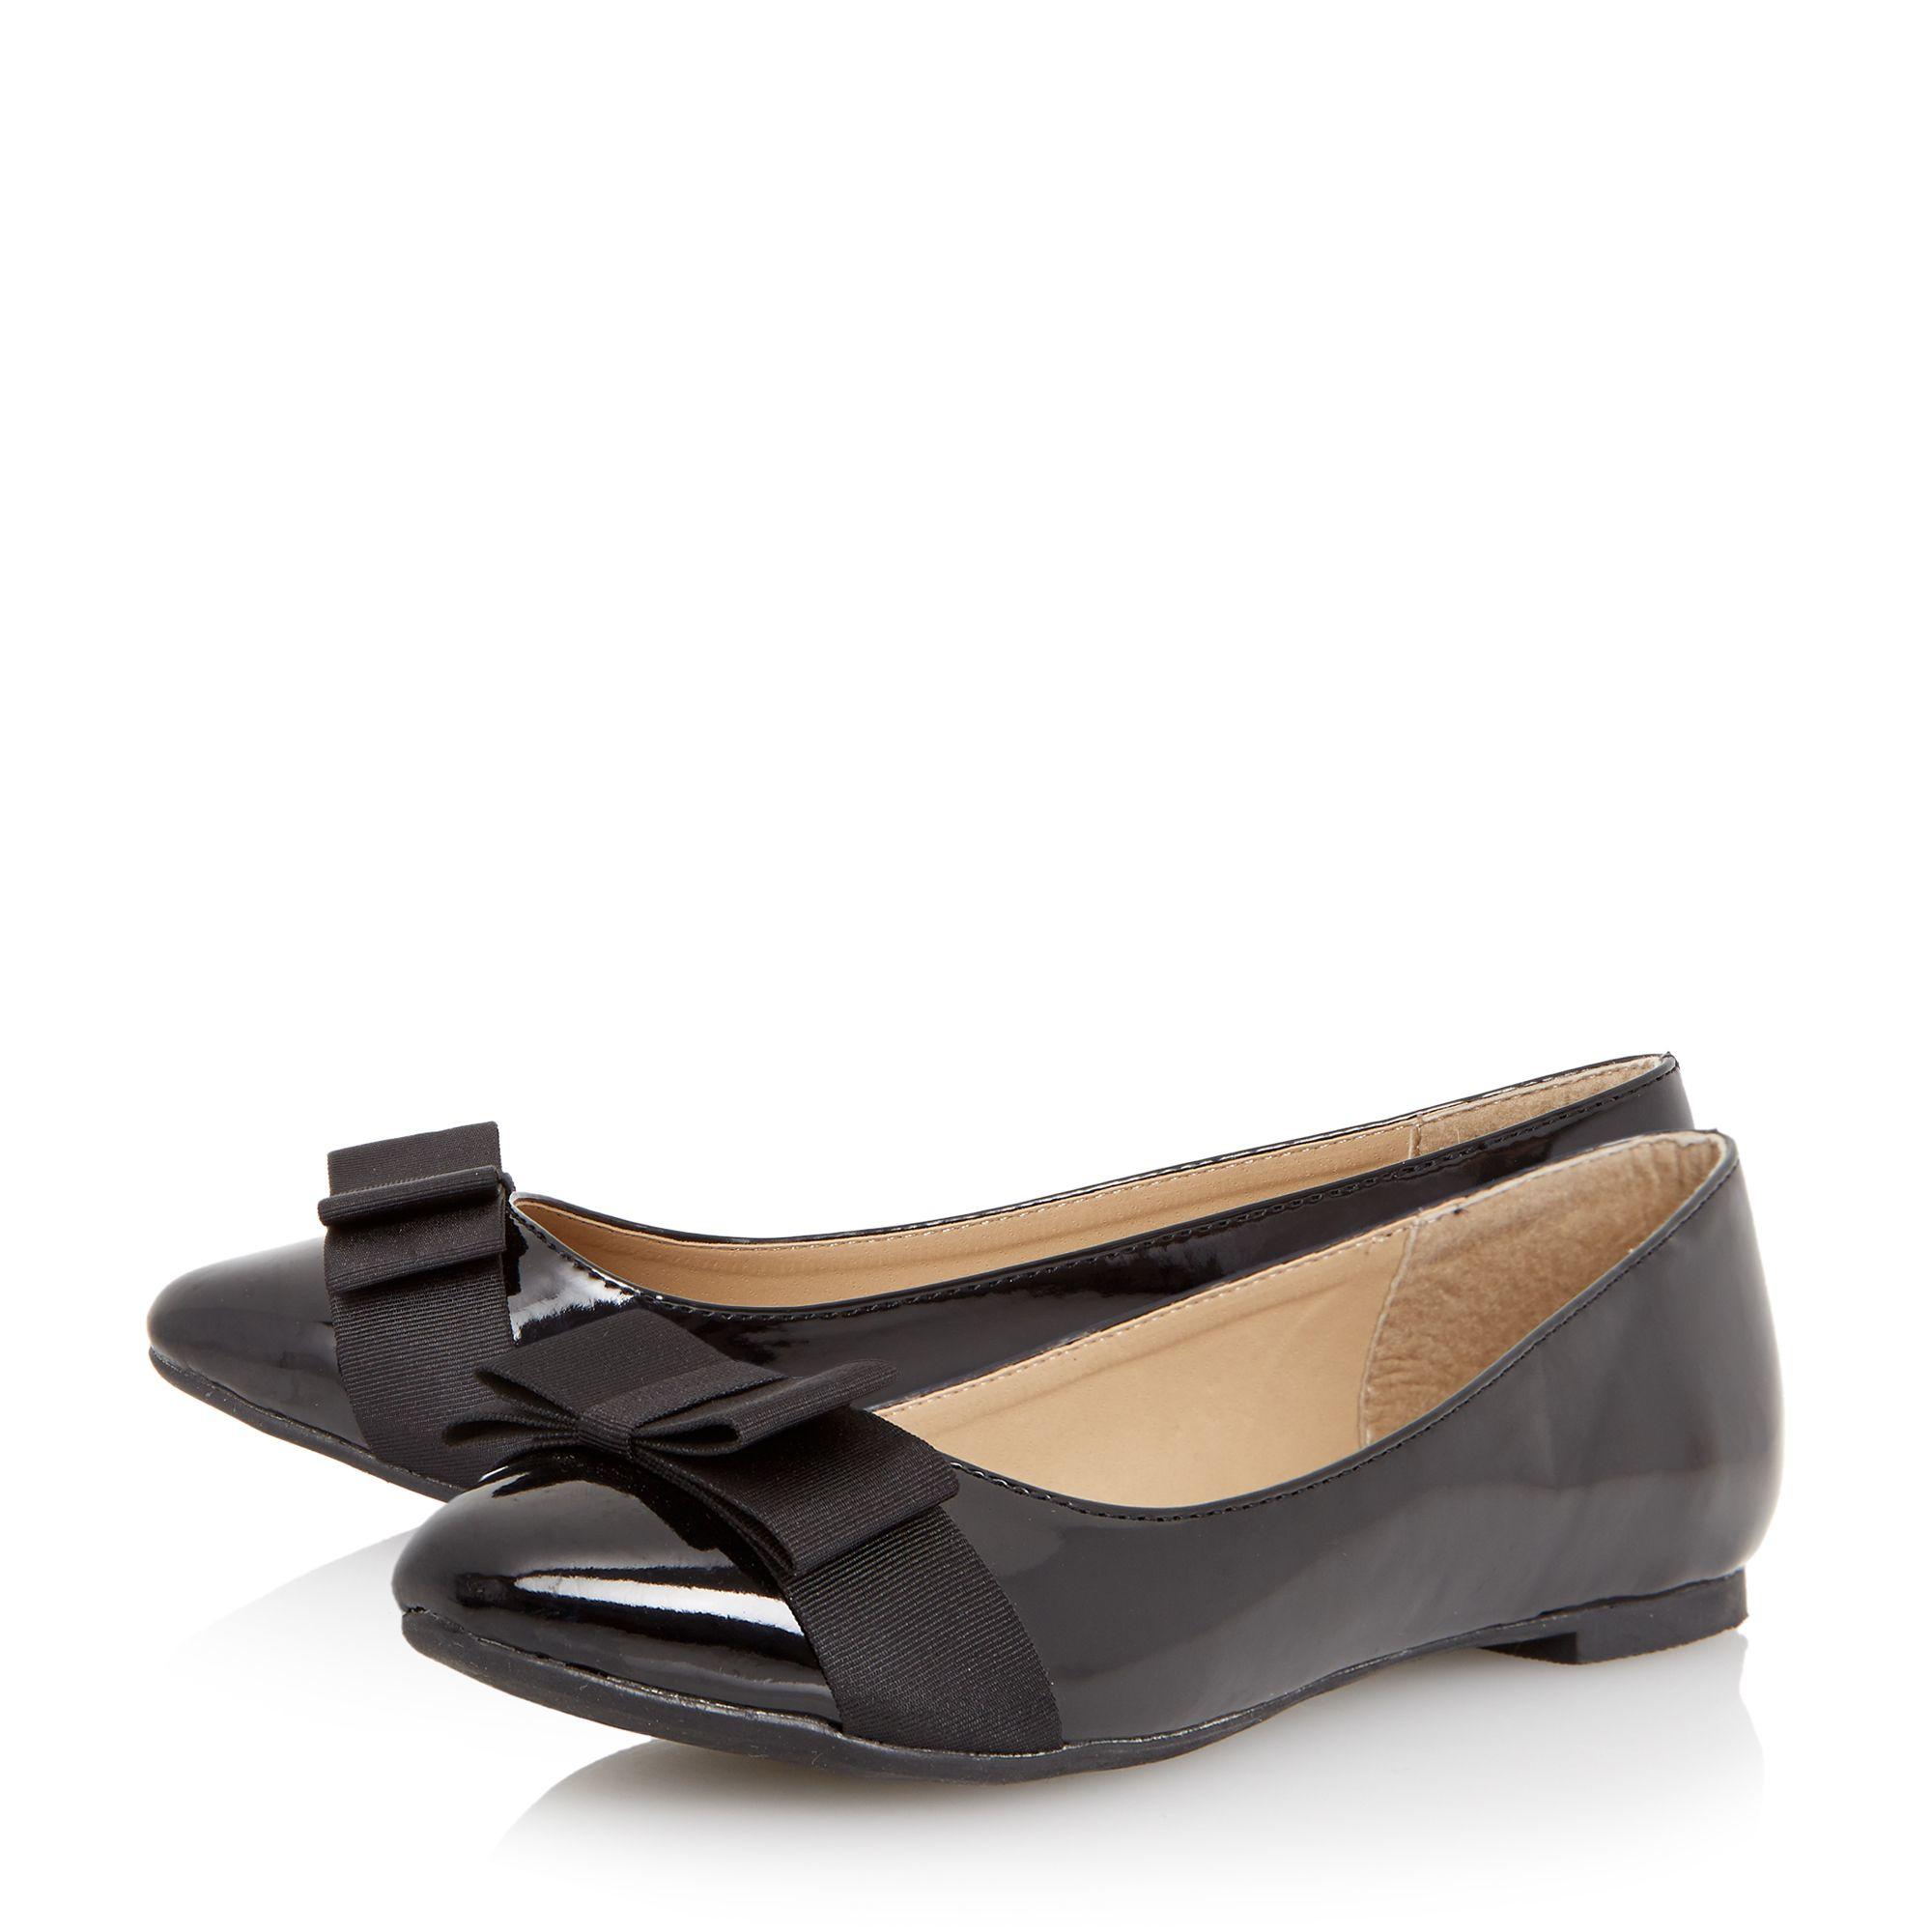 Dune Herva Bow Detail Ballerina Flat Shoes In Black   Lyst